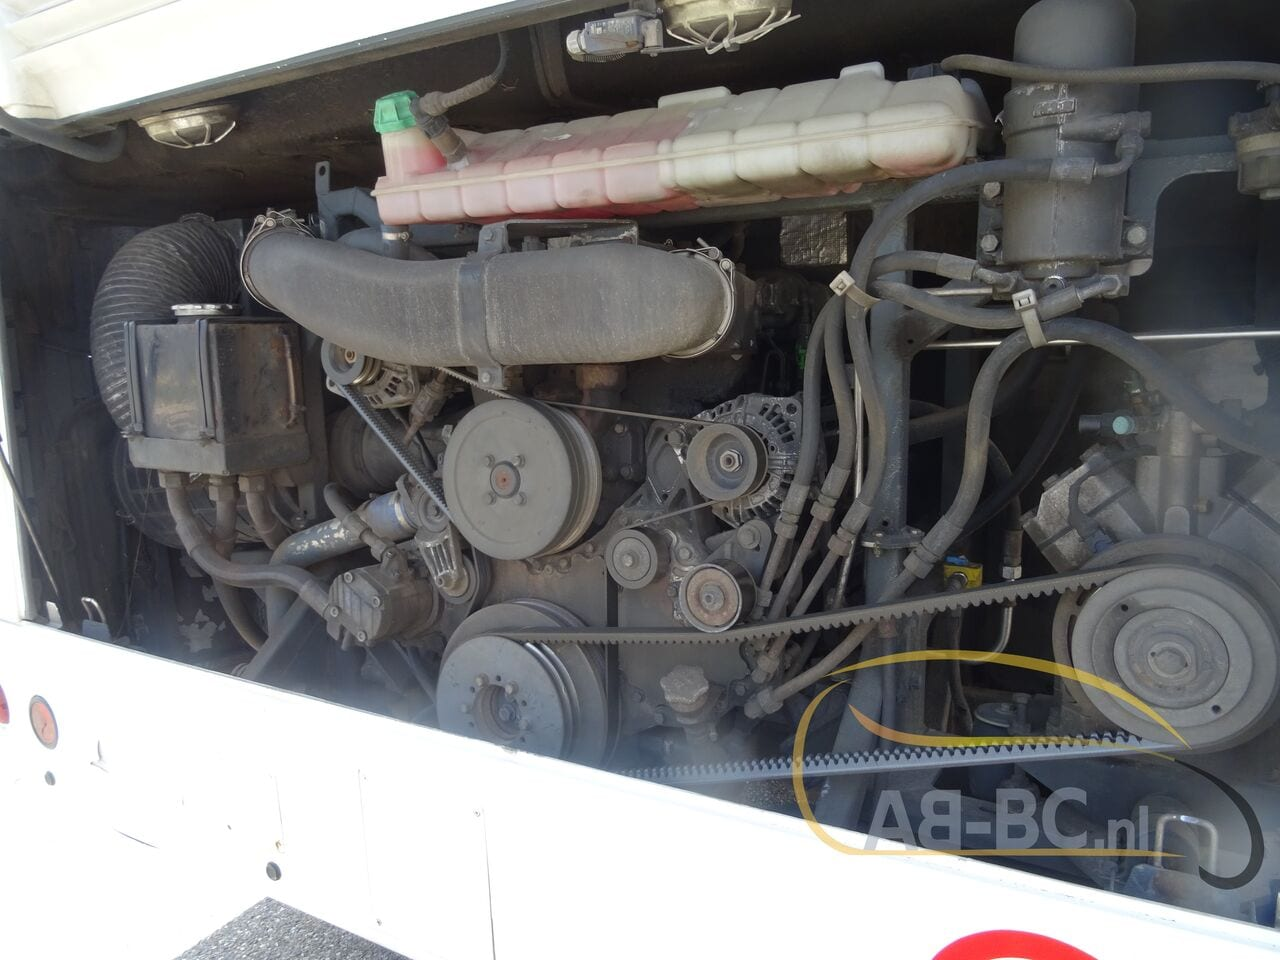 coach-busTEMSA-Safari-RD-DAF-Motor-53-Seats-Euro-5---1623932690001475199_big_3c044a6ce52a0e189b515b5a0a95386a--21061715155620919600